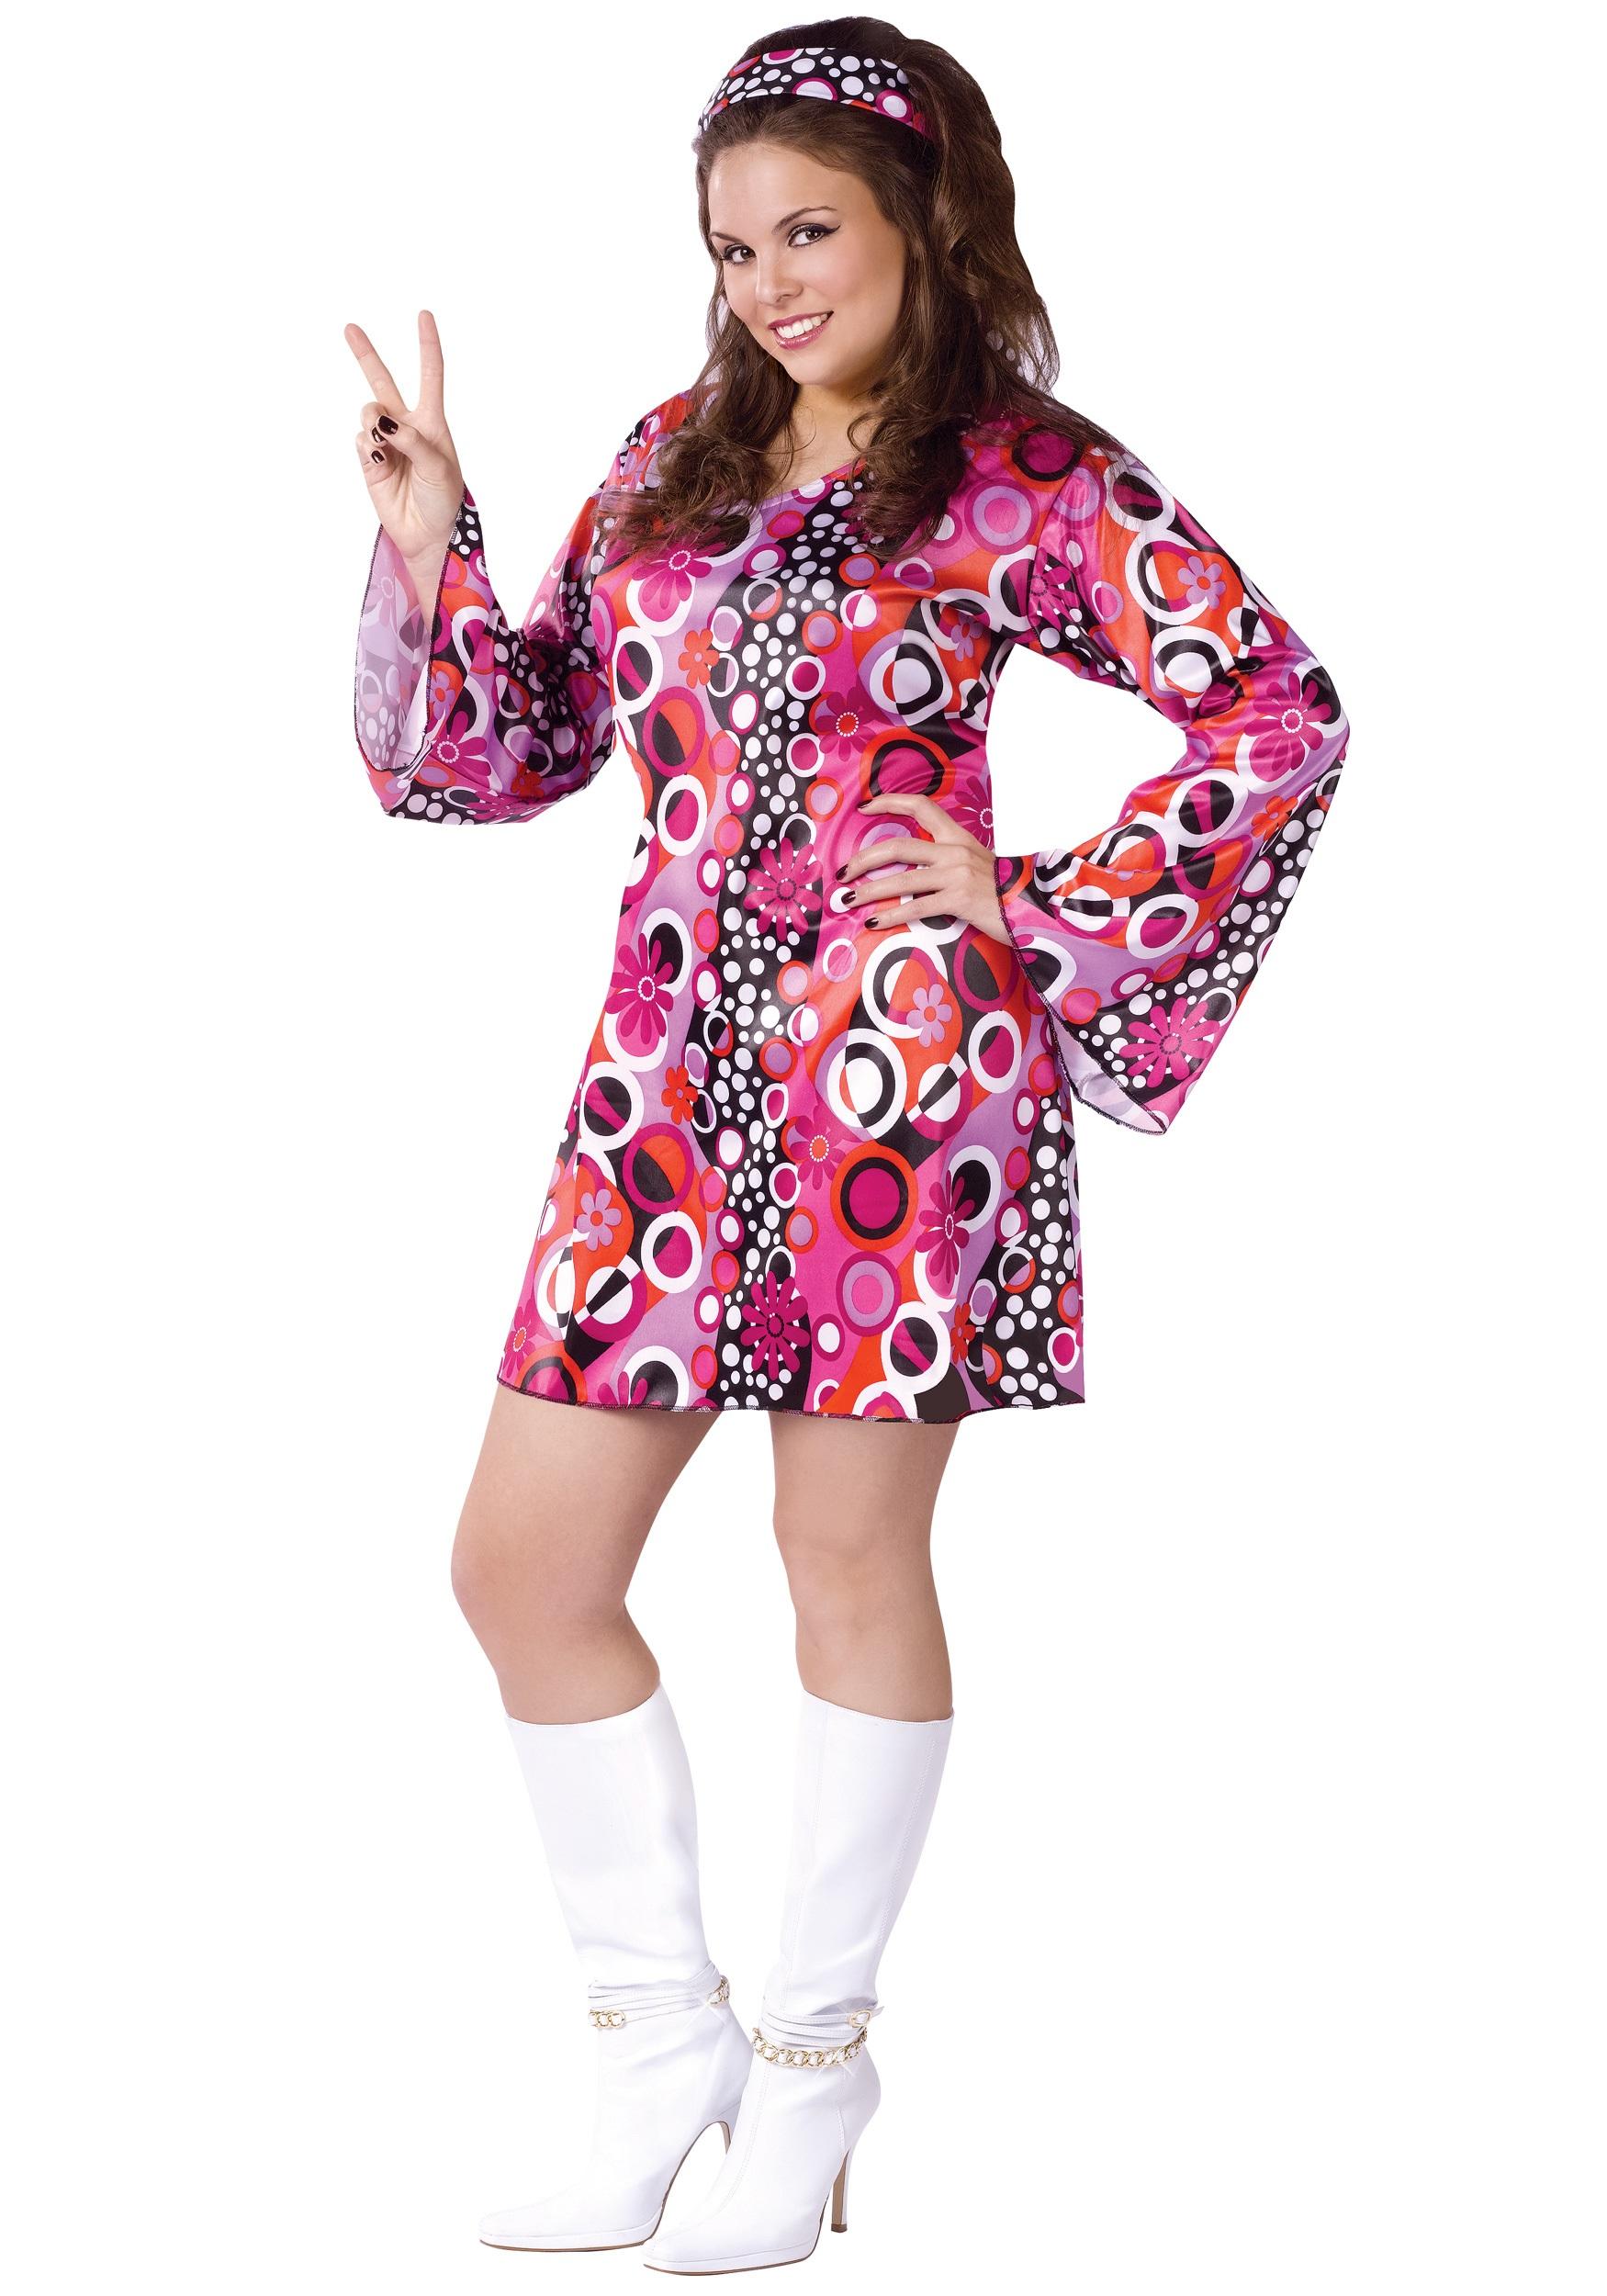 Plus Size Feelin' Groovy Dress Costume | Vintage 70s Dress